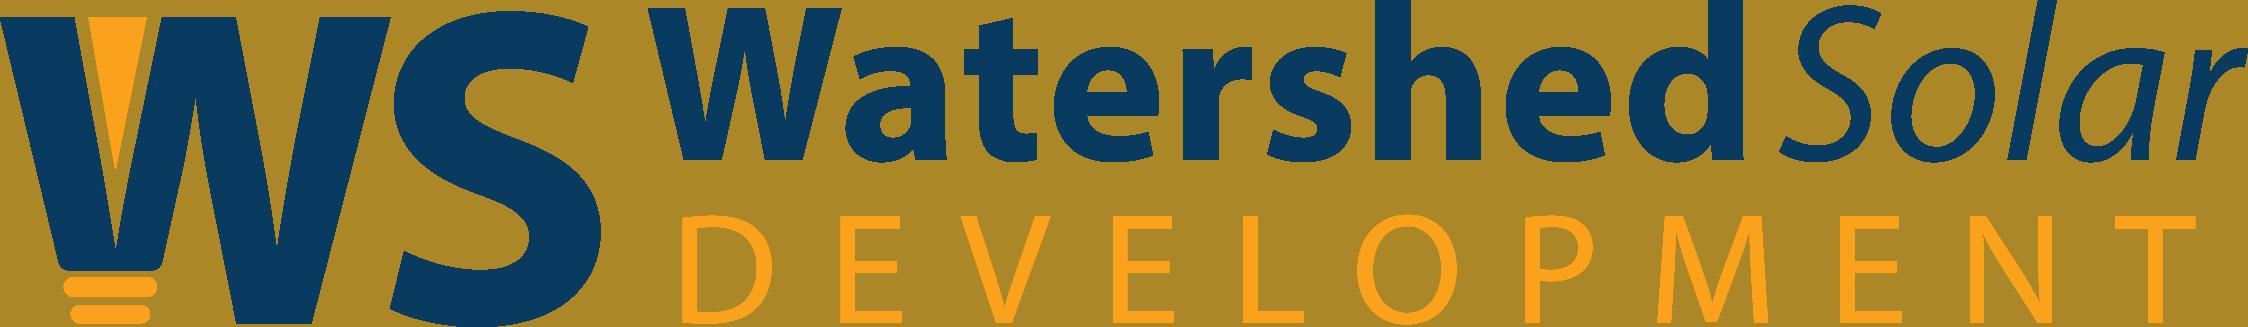 Watershed Solar Development Logo